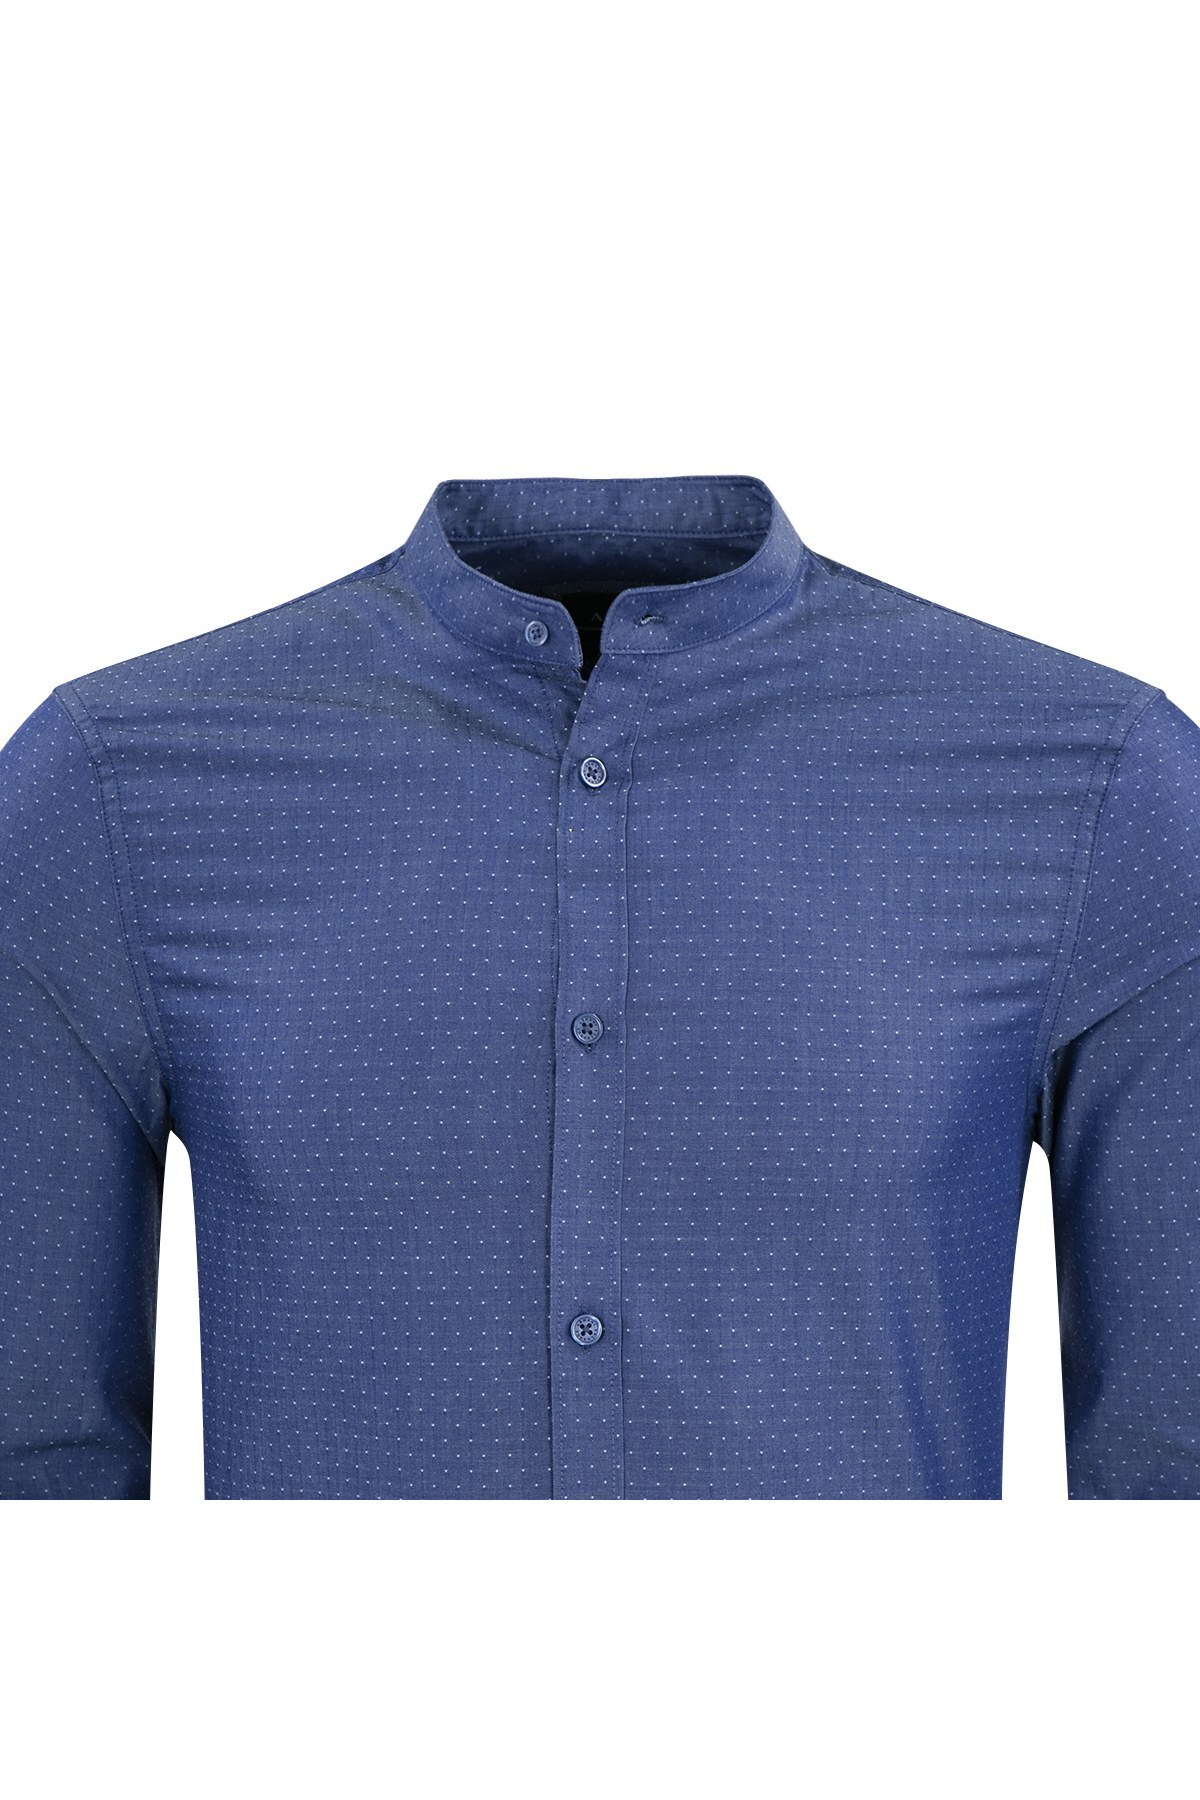 ARMANI EXCHANGE Erkek Gömlek 6ZZC69 ZNZGZ 5570 LACİVERT